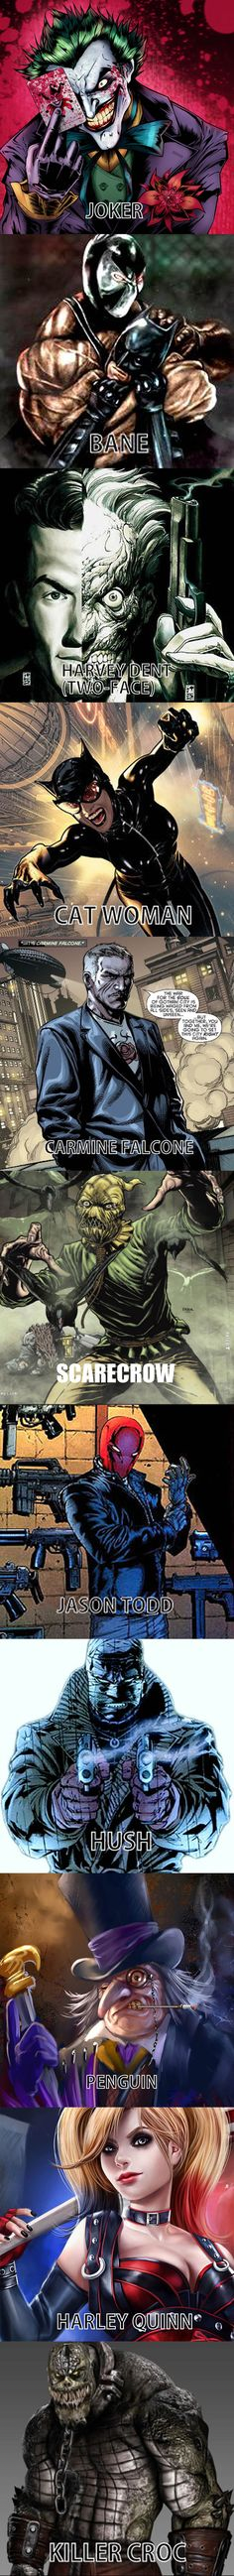 BATMAN VILLIANS Joker, Bane, Carmine Falcone, Scarecrow, Penguin, Harley Quinn, Hush, Killer Croc, Jason Todd, Catwoman ,Two Face